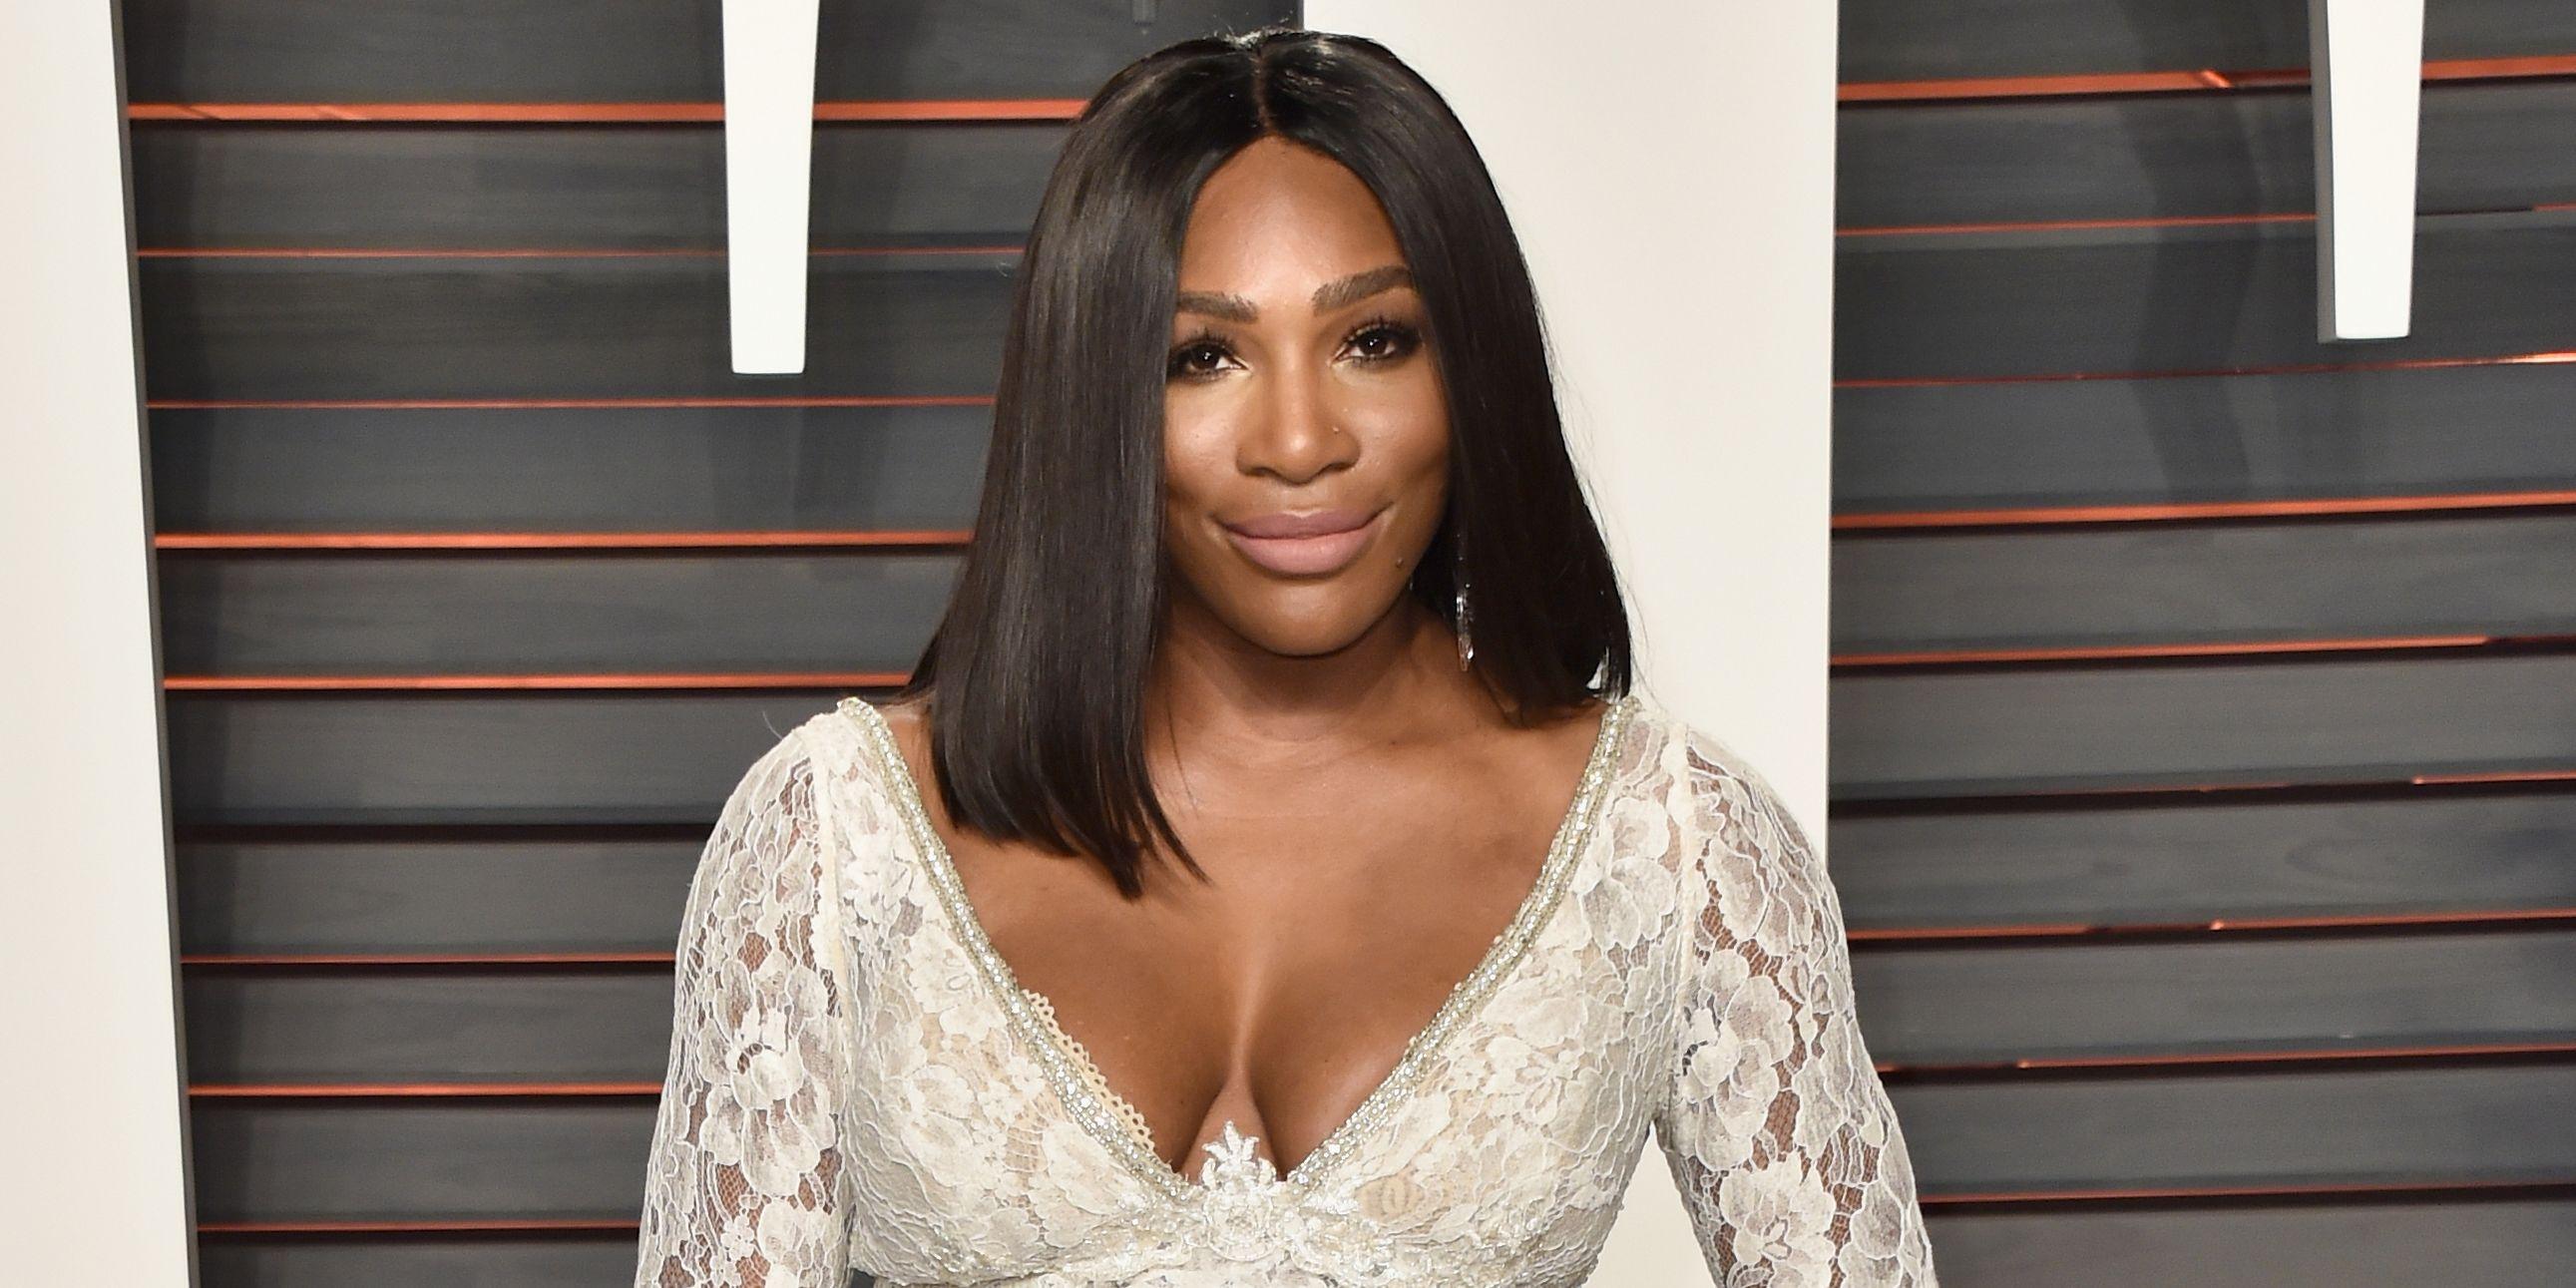 2016 Vanity Fair Oscar Party - Serena Williams